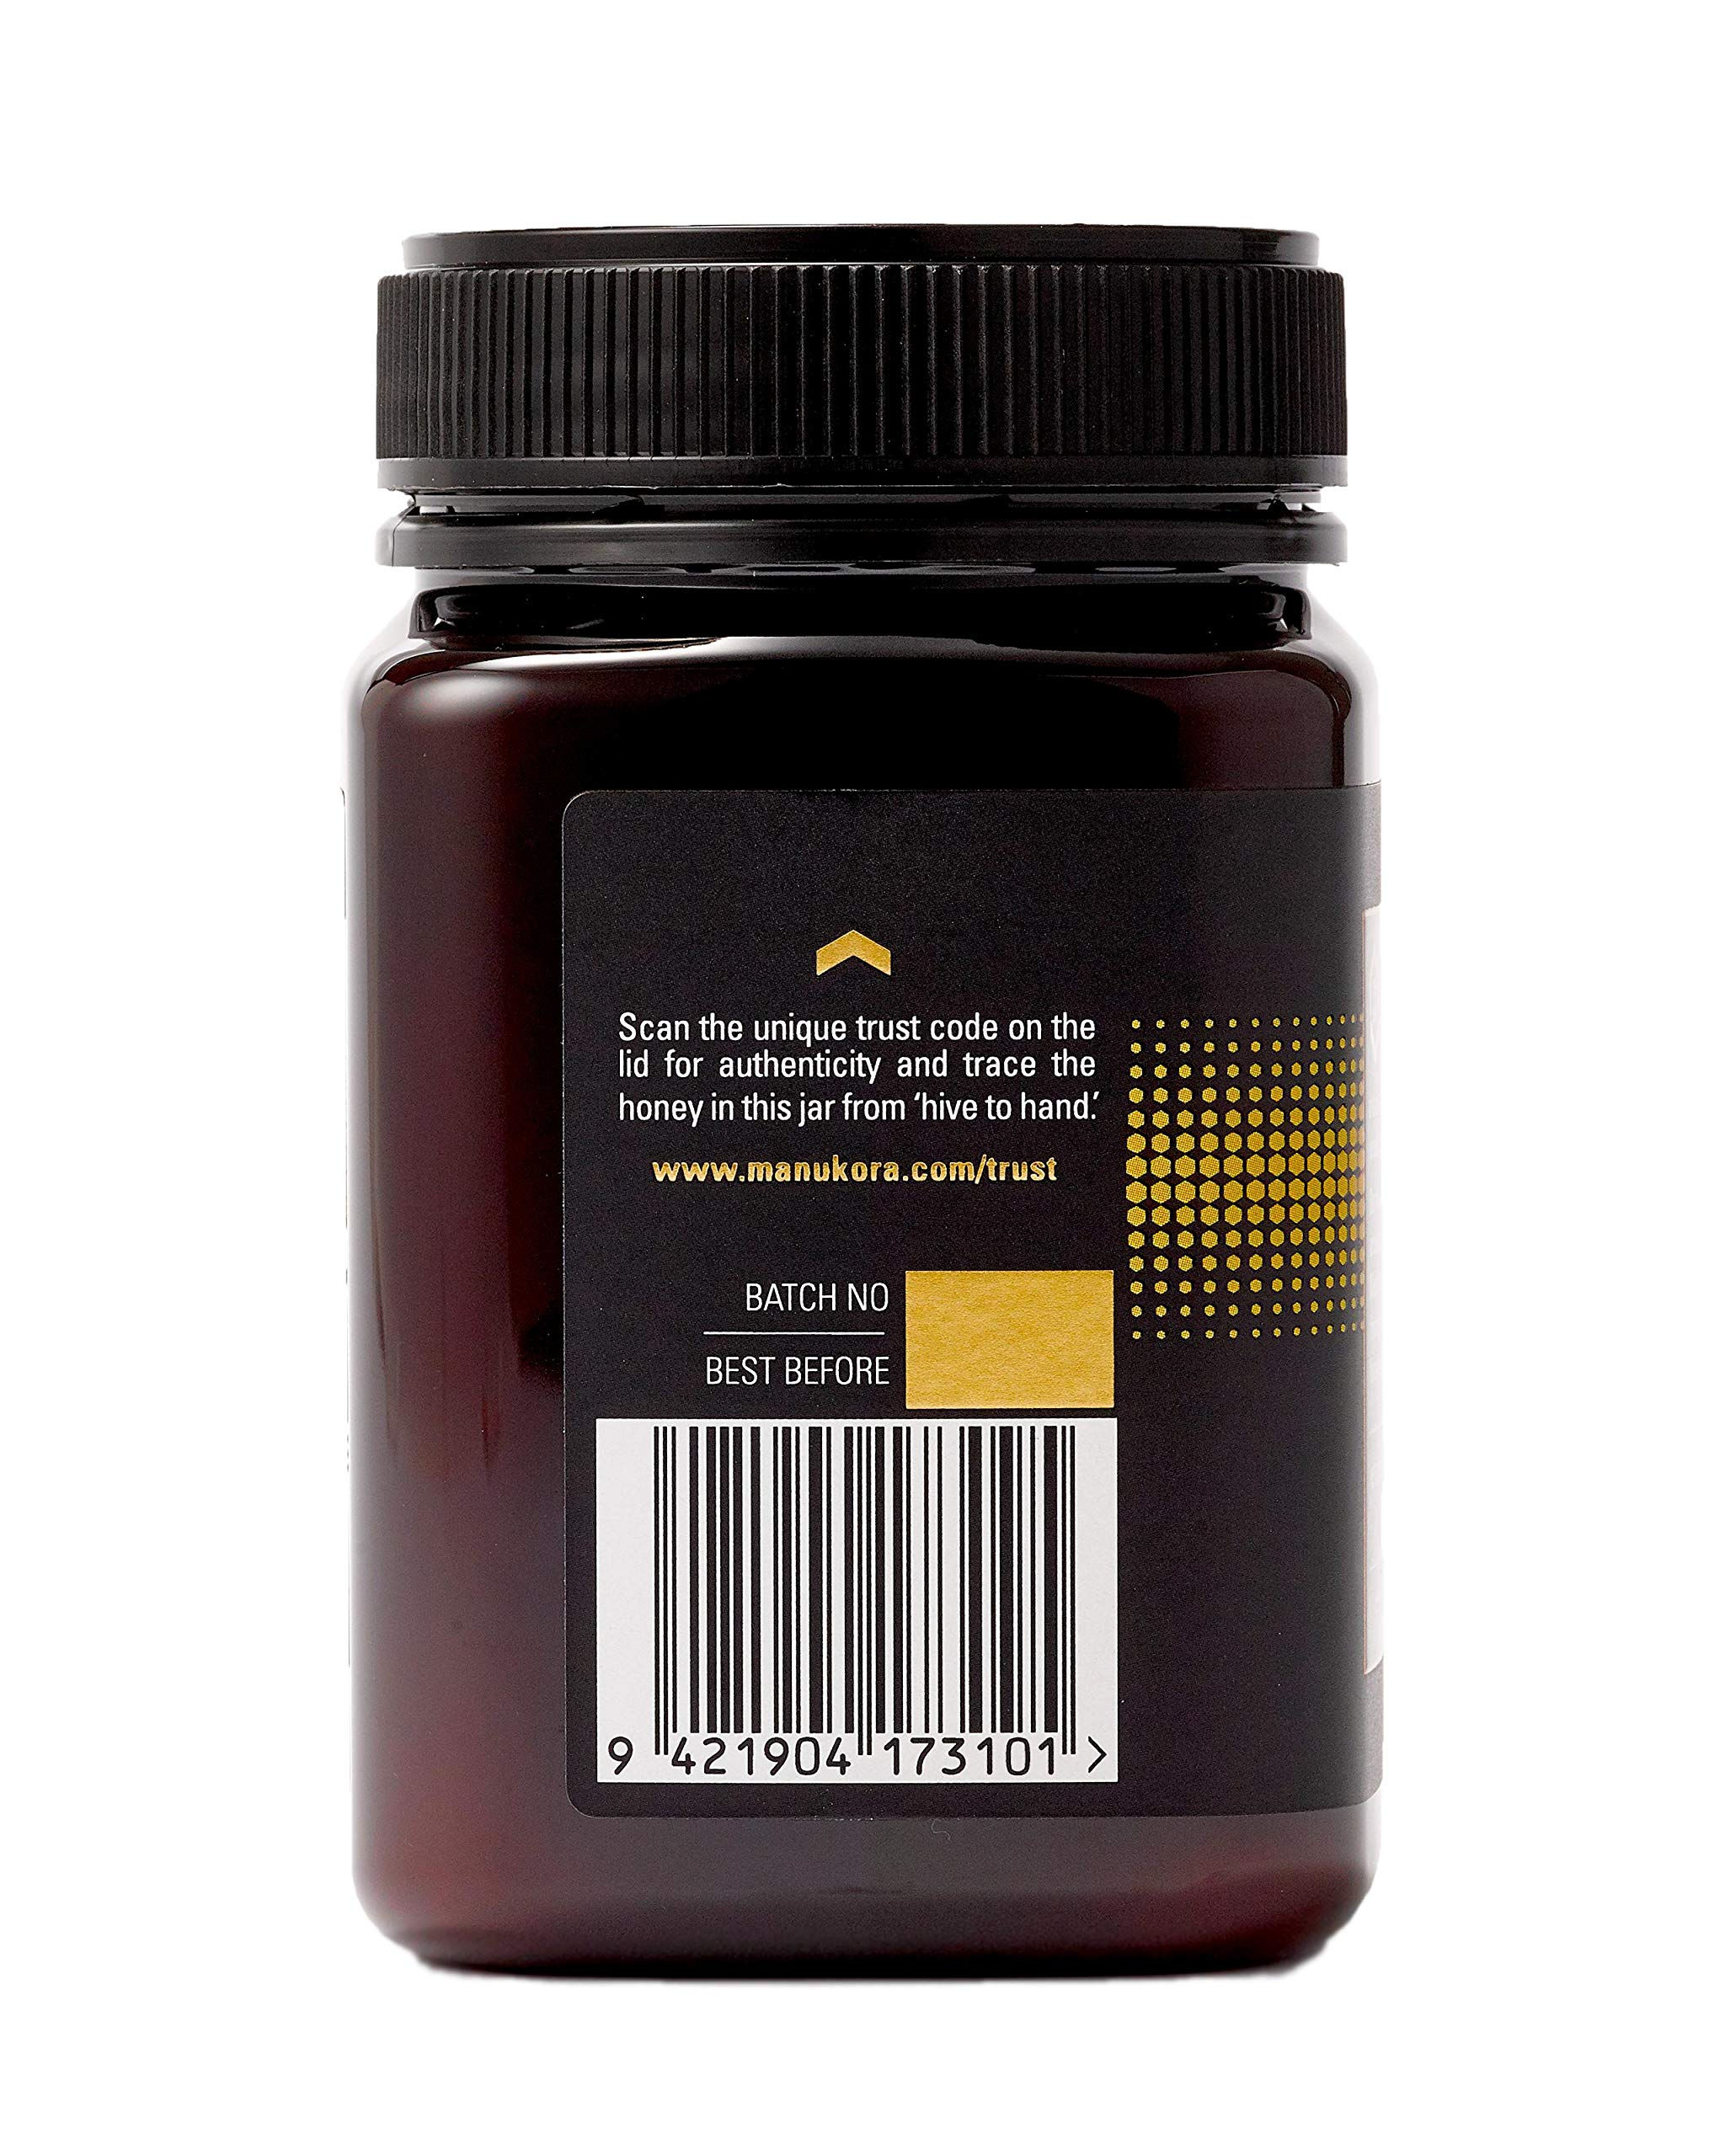 Manukora UMF 20+/MGO 830+ Raw Mānuka Honey (500g/1.1lb) Authentic Non-GMO New Zealand Honey, UMF & MGO Certified, Traceable from Hive to Hand by Manukora (Image #6)